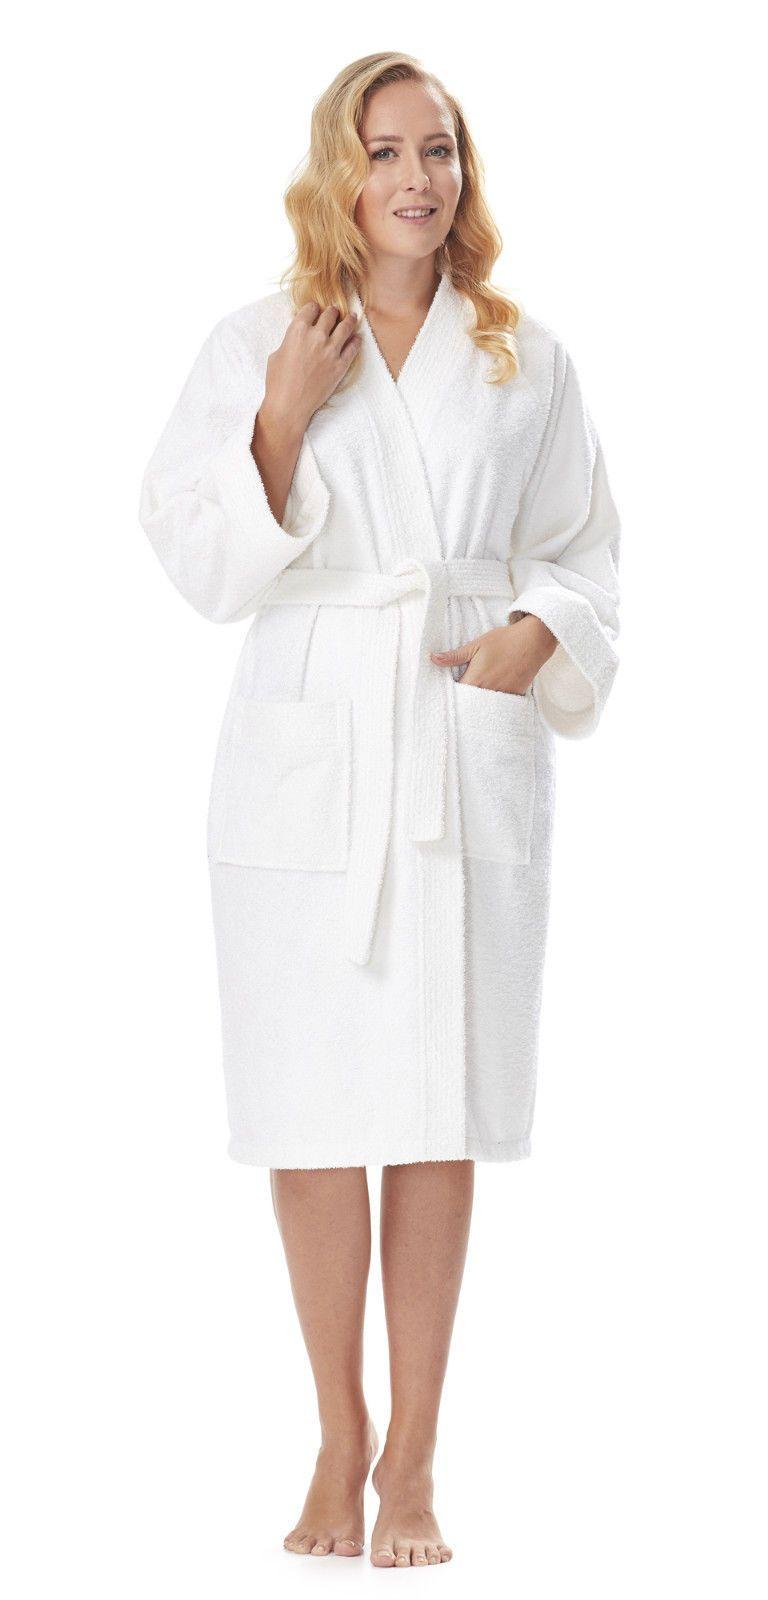 8f632f9c77 Arus Women s Short Kimono Lightweight Bathrobe Turkish Cotton Terry Cloth  Robe